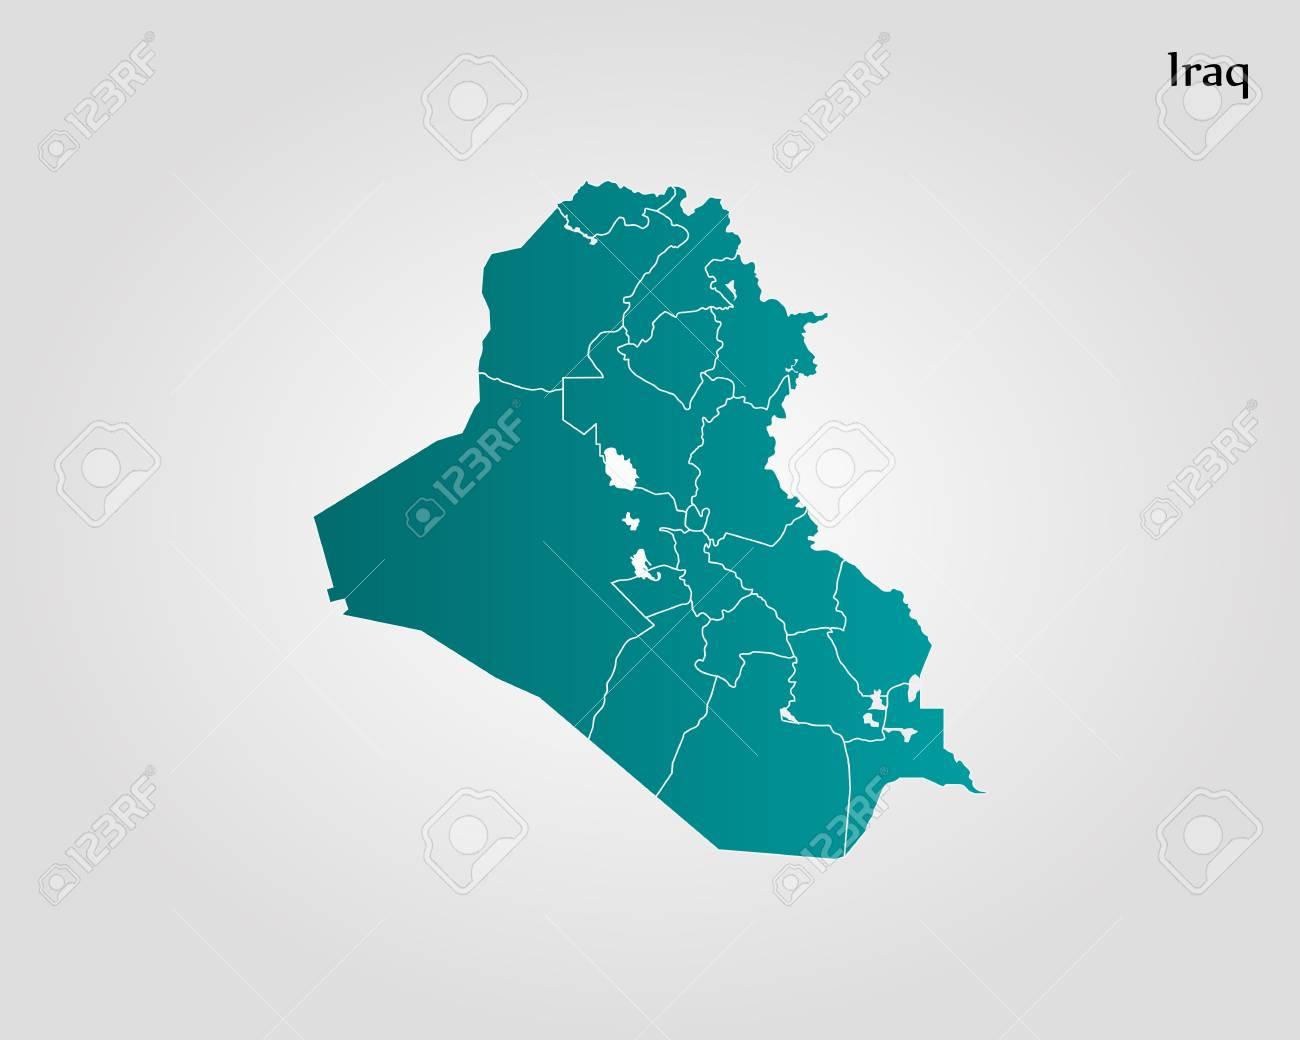 Map of iraq vector illustration world map ilustraciones map of iraq vector illustration world map foto de archivo 89750726 gumiabroncs Choice Image